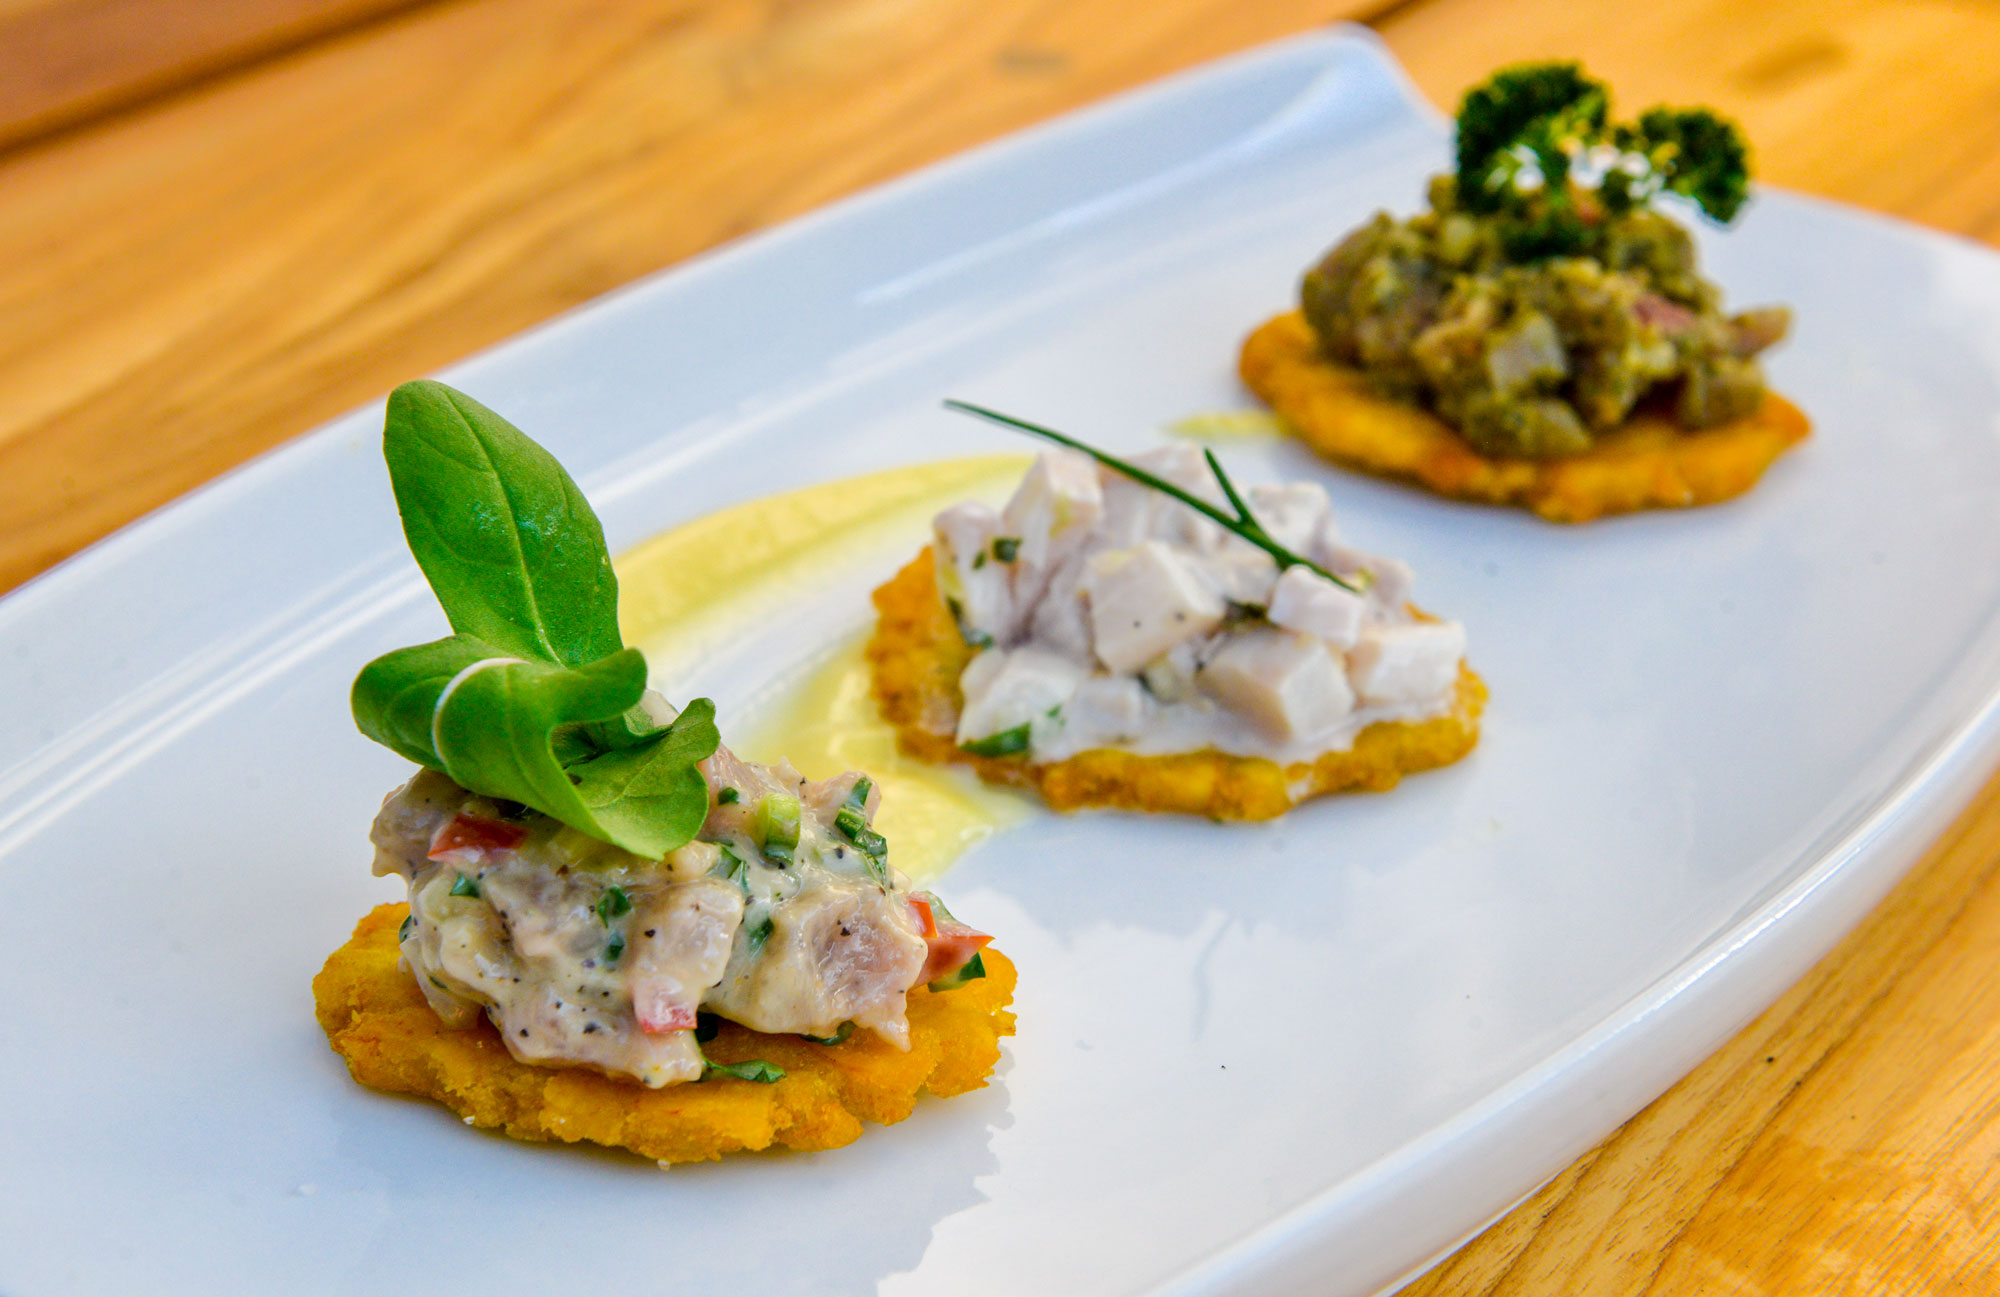 Trio-Patacones-Tuna-Mayo-Corvina-Ceviche-Tuna-Pesto.jpg